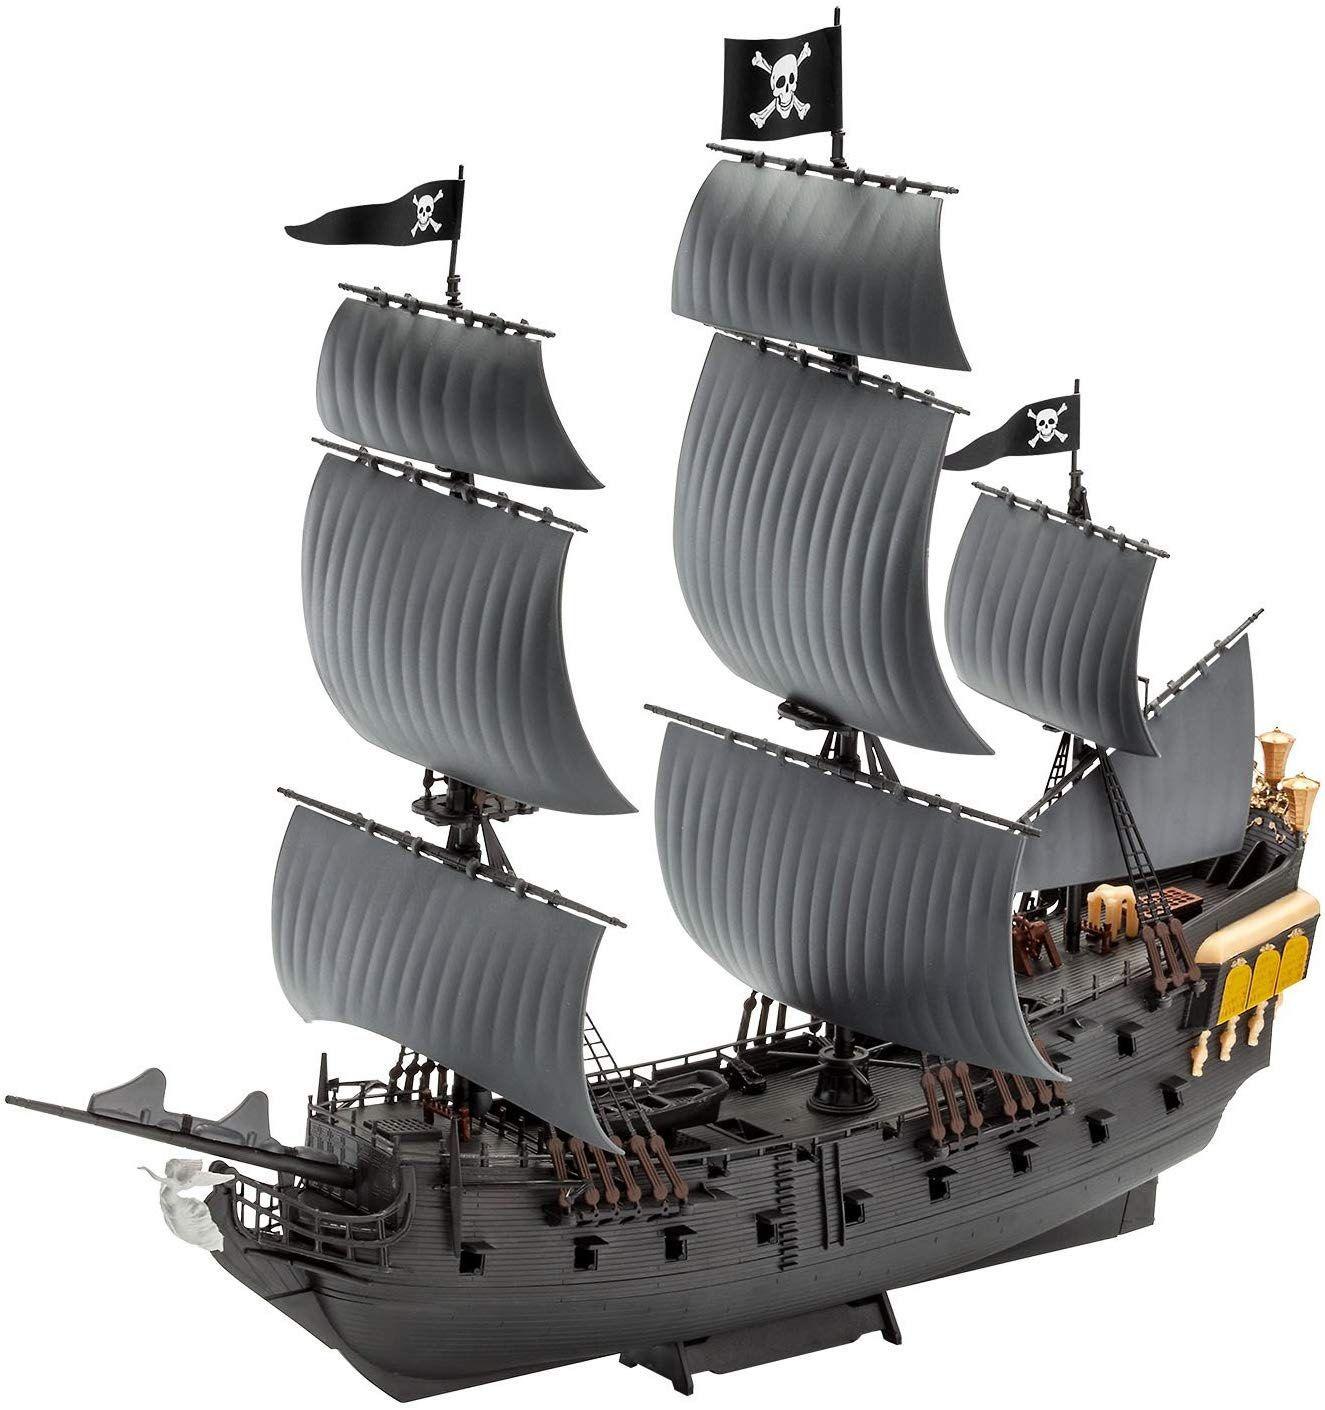 Model Set Black Pearl easy-click - 1/150 - Revell 65499  - BLIMPS COMÉRCIO ELETRÔNICO